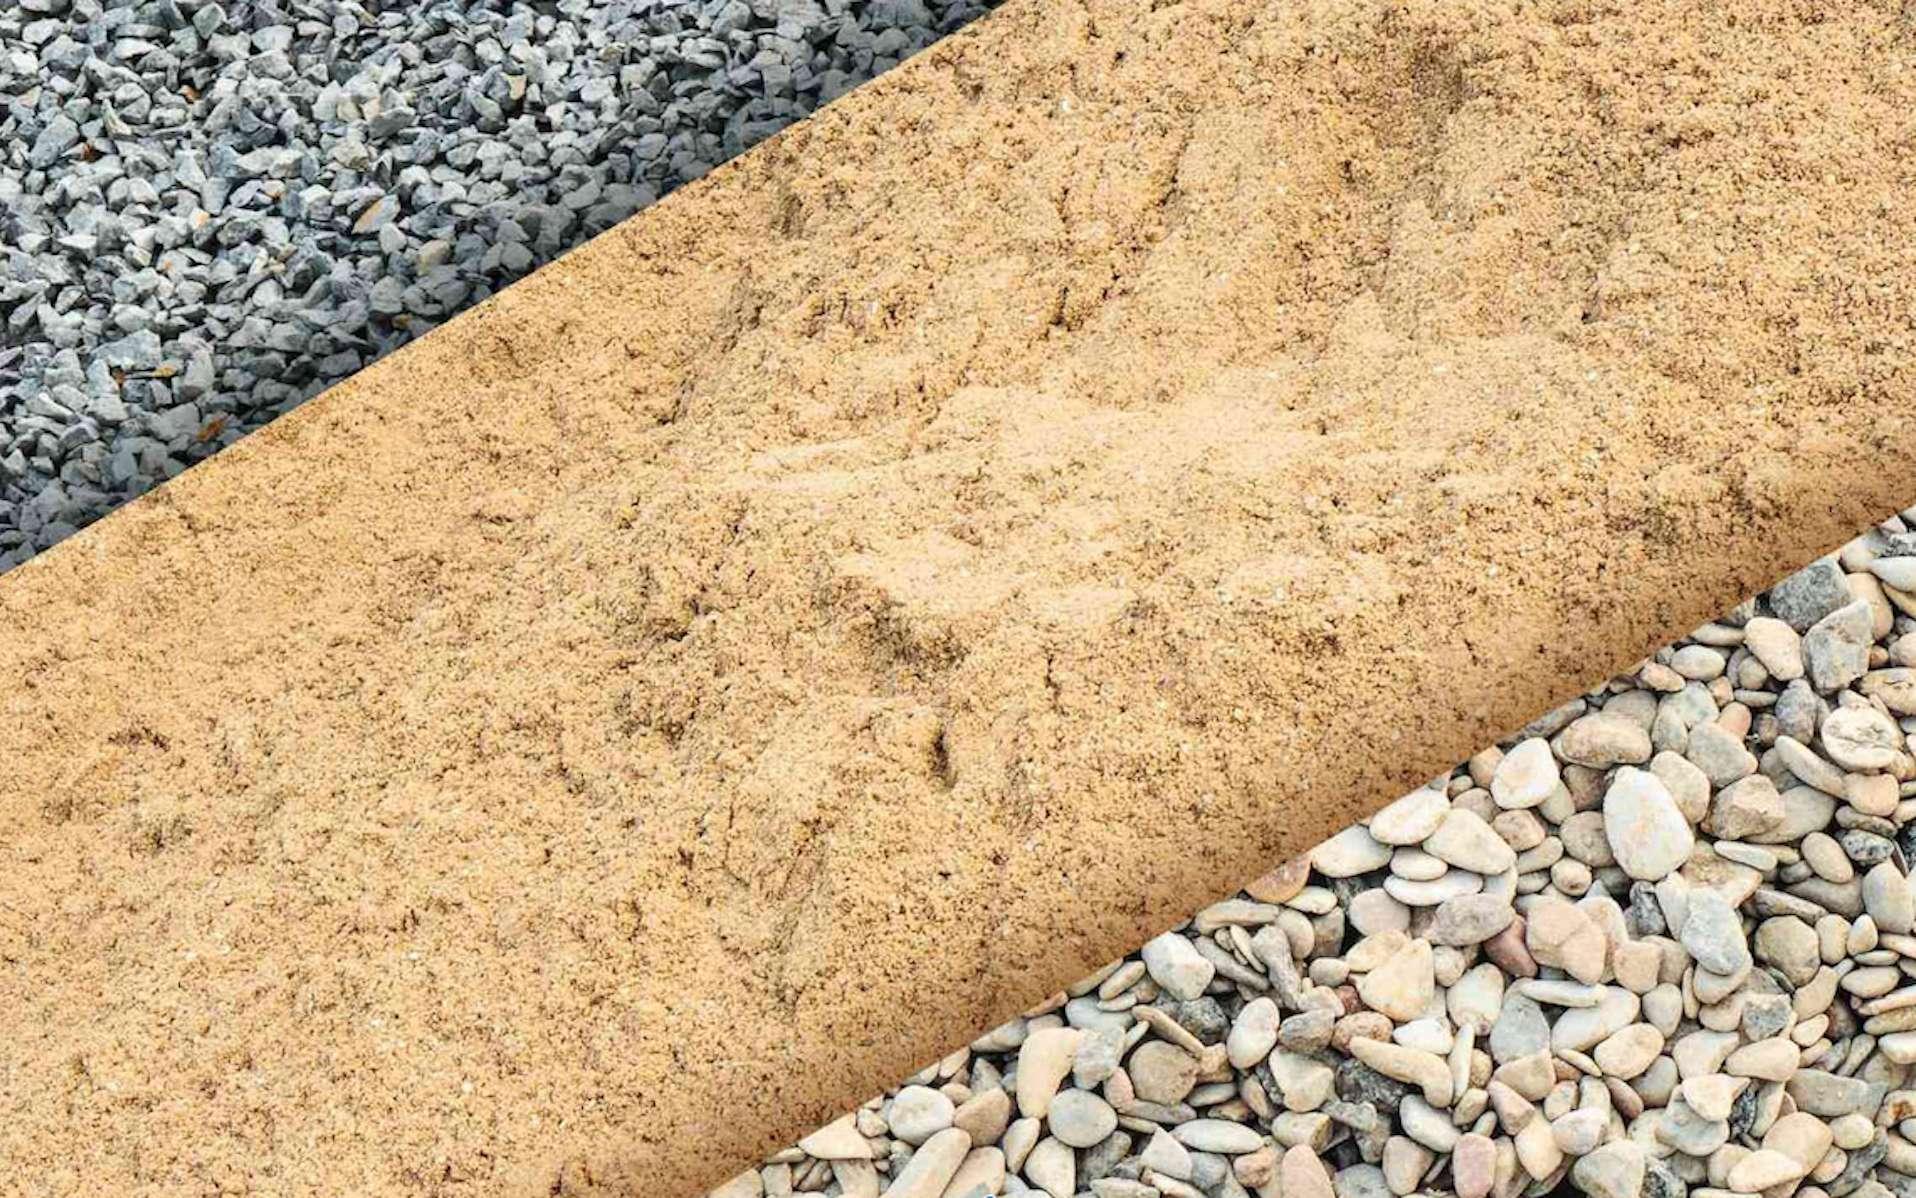 Les granulats, des fragments de minéraux de grosseurs différentes. © Teralta CRH